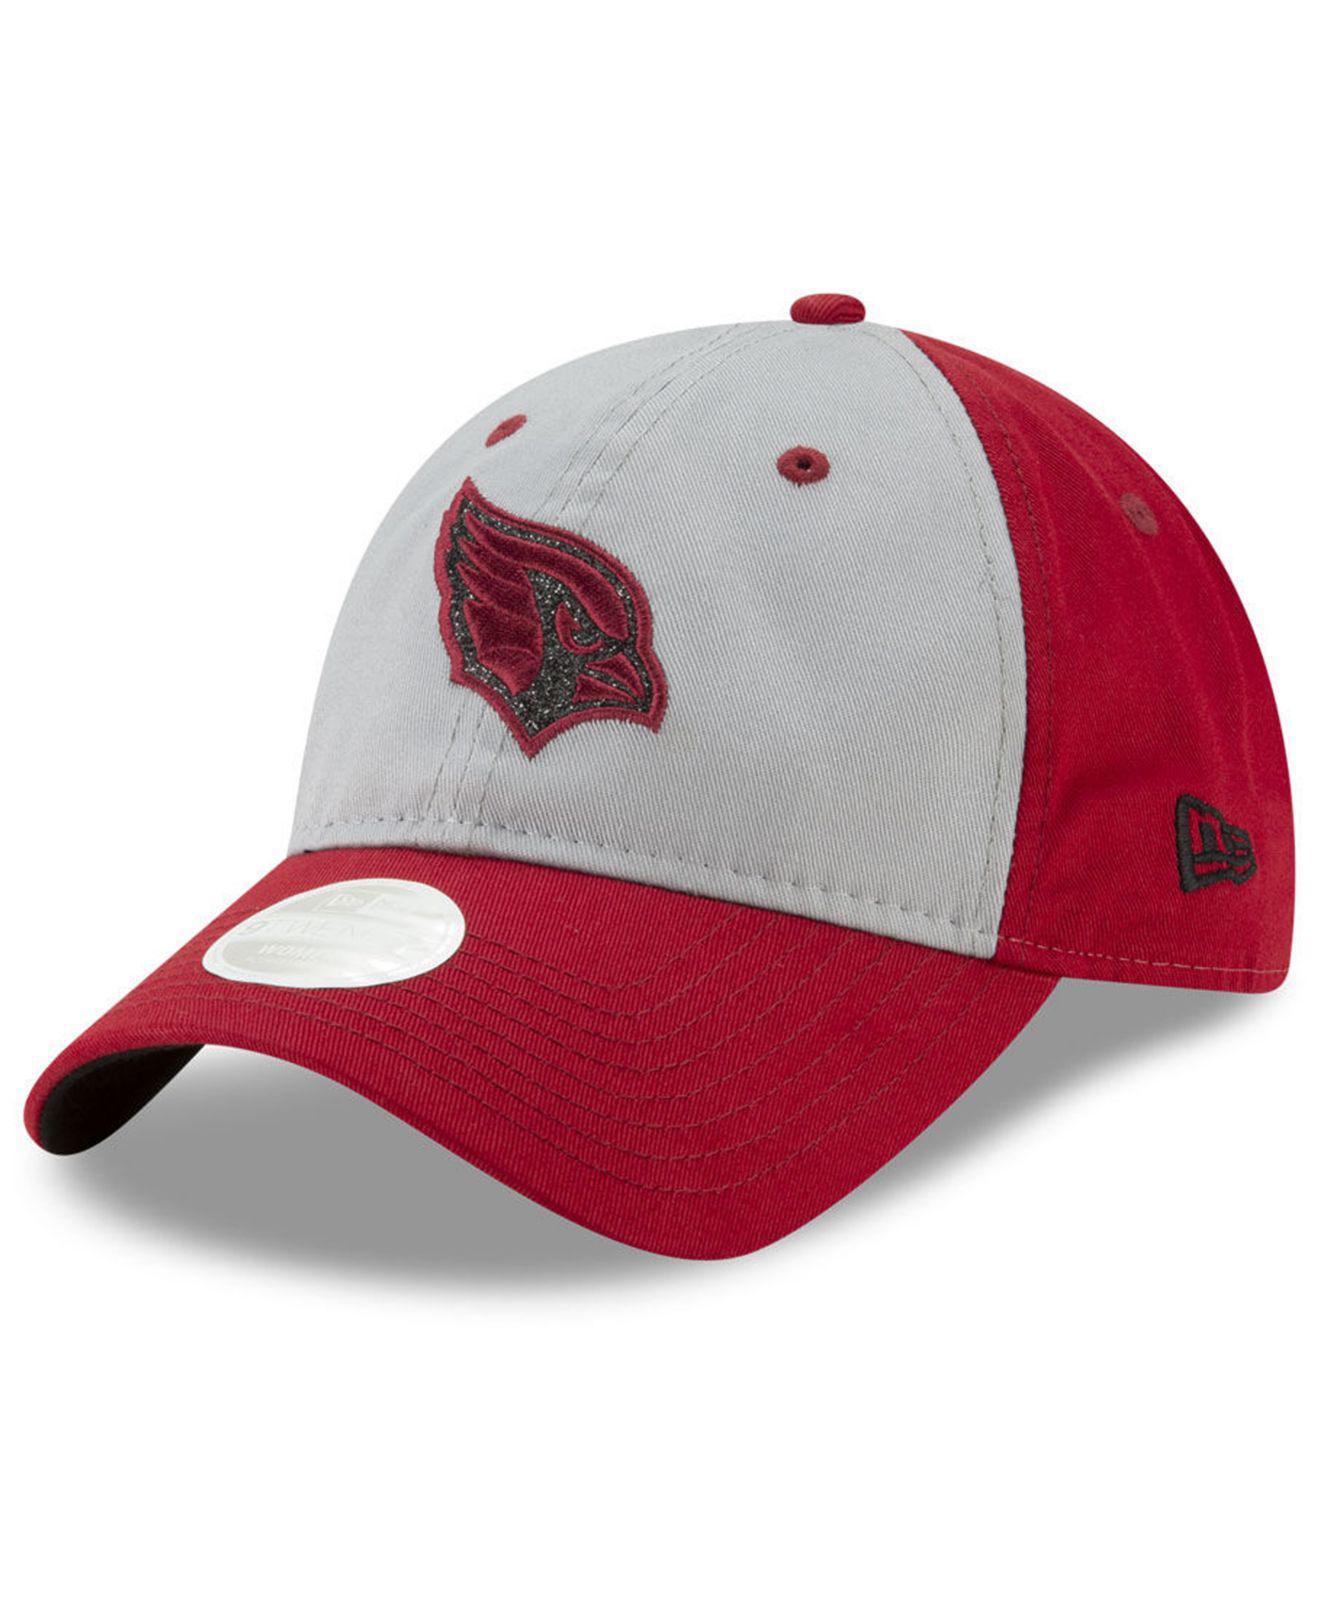 finest selection d60b6 c664f ... free shipping ktz. womens red arizona cardinals gray glitter 9twenty cap  4e69c 27829